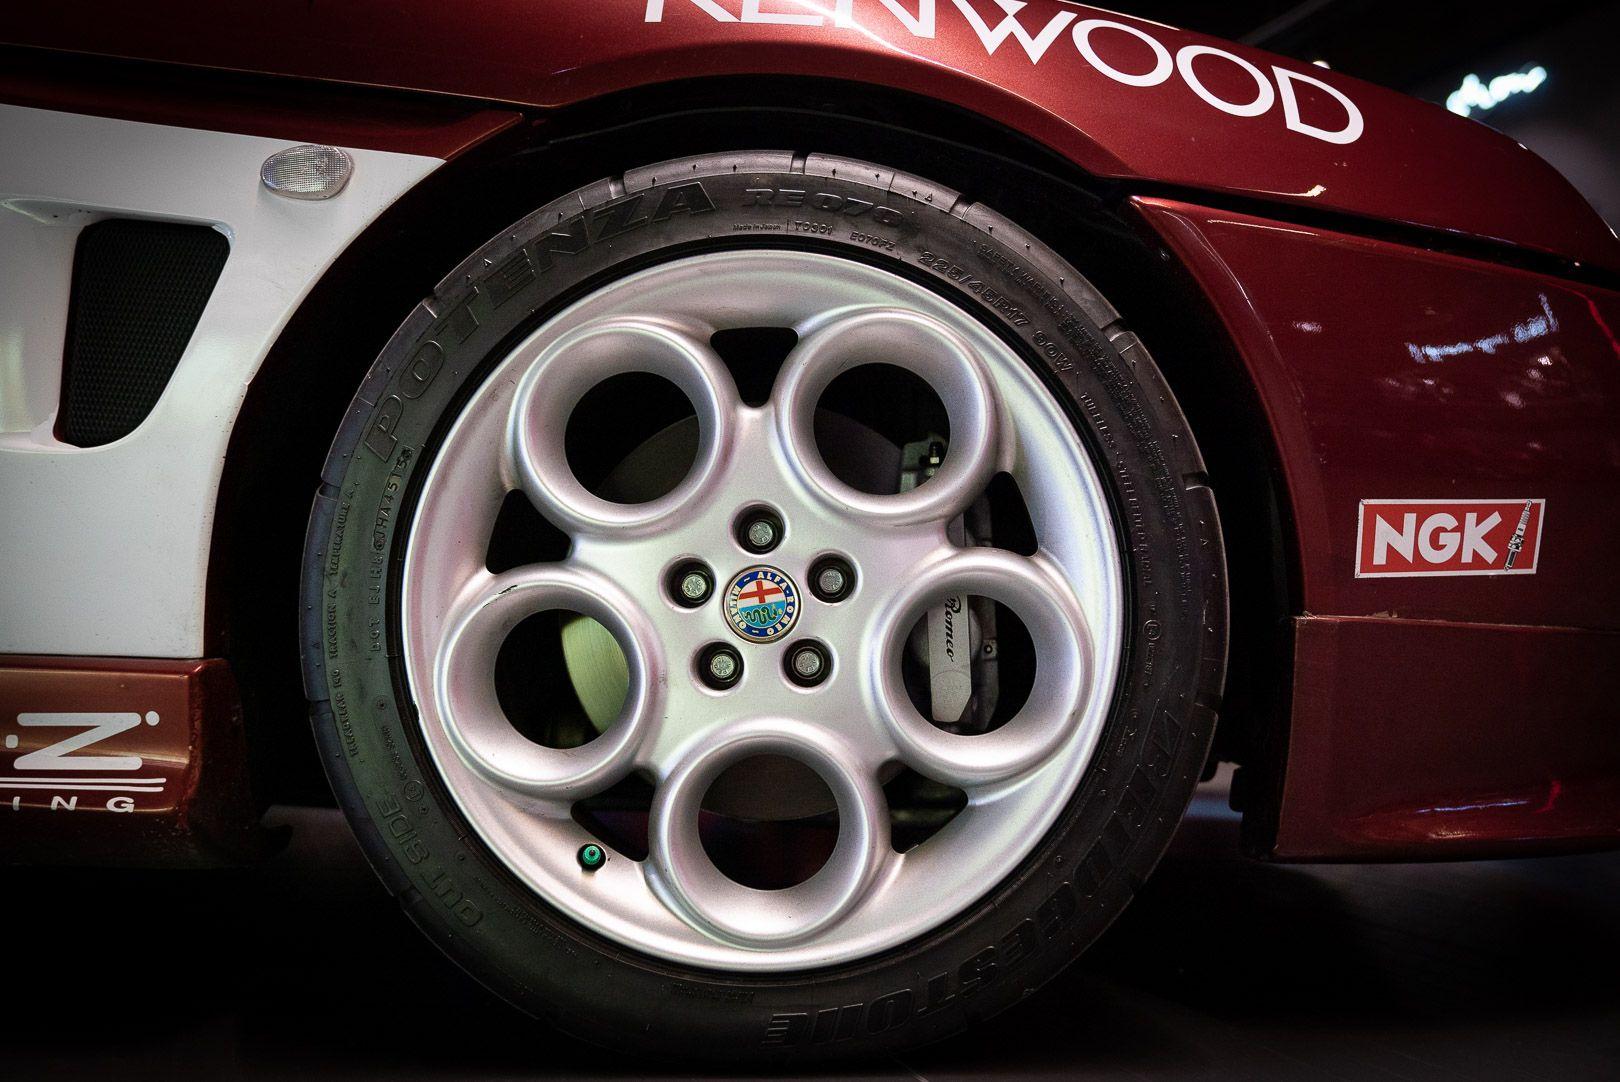 1995 Alfa Romeo GTV 2.0 V6 Turbo Cup Replica 59925